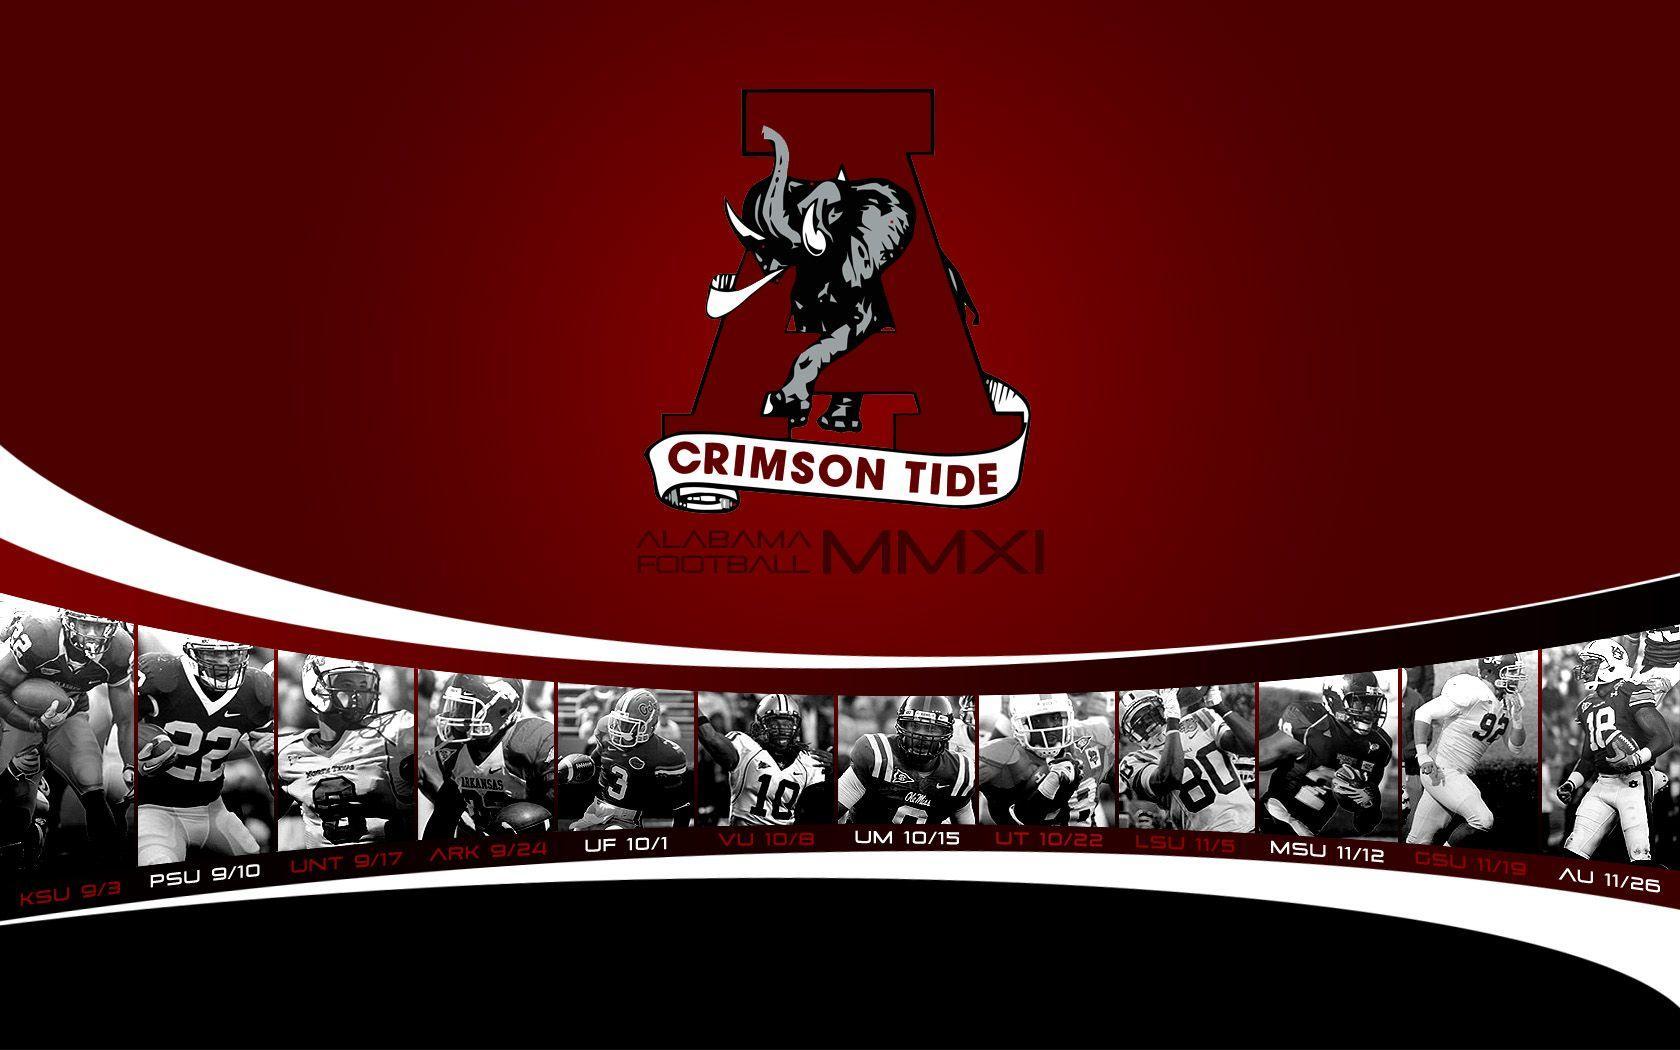 University Of Alabama Football Schedule 2017 >> 2016 Cool Alabama Football Backgrounds - Wallpaper Cave